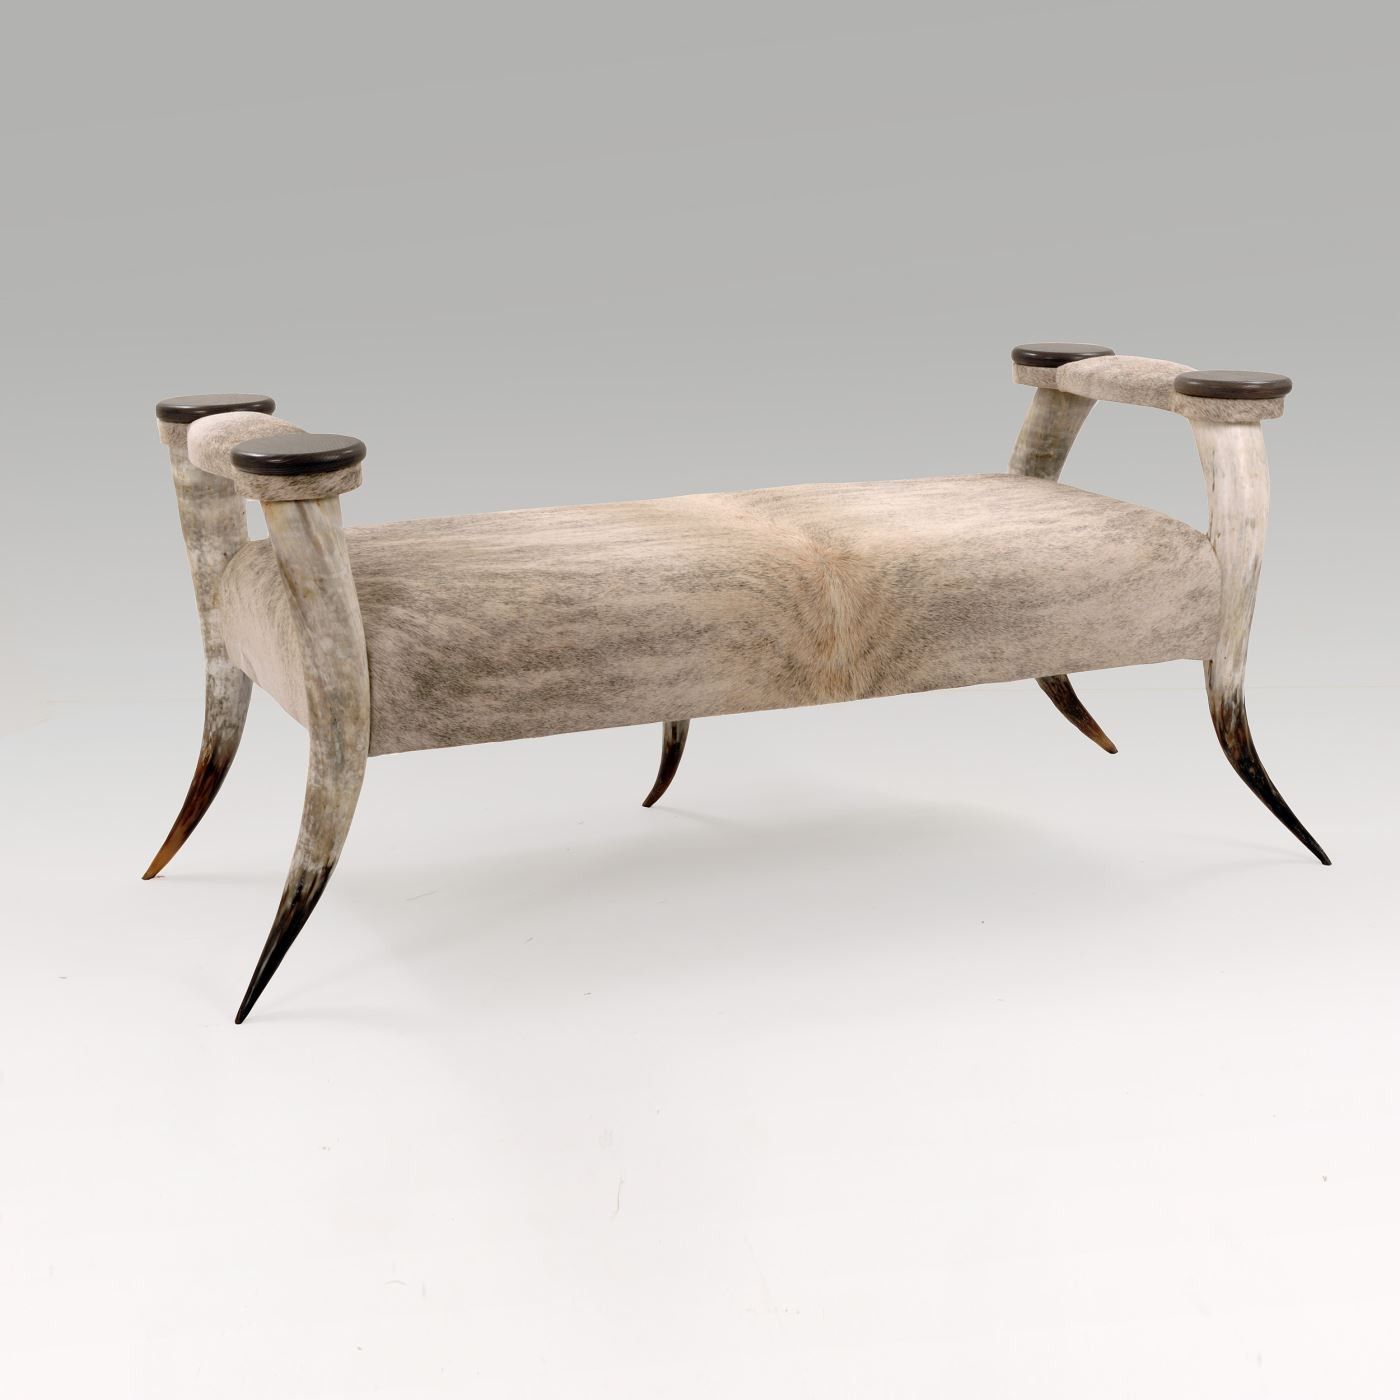 Ankole Bench